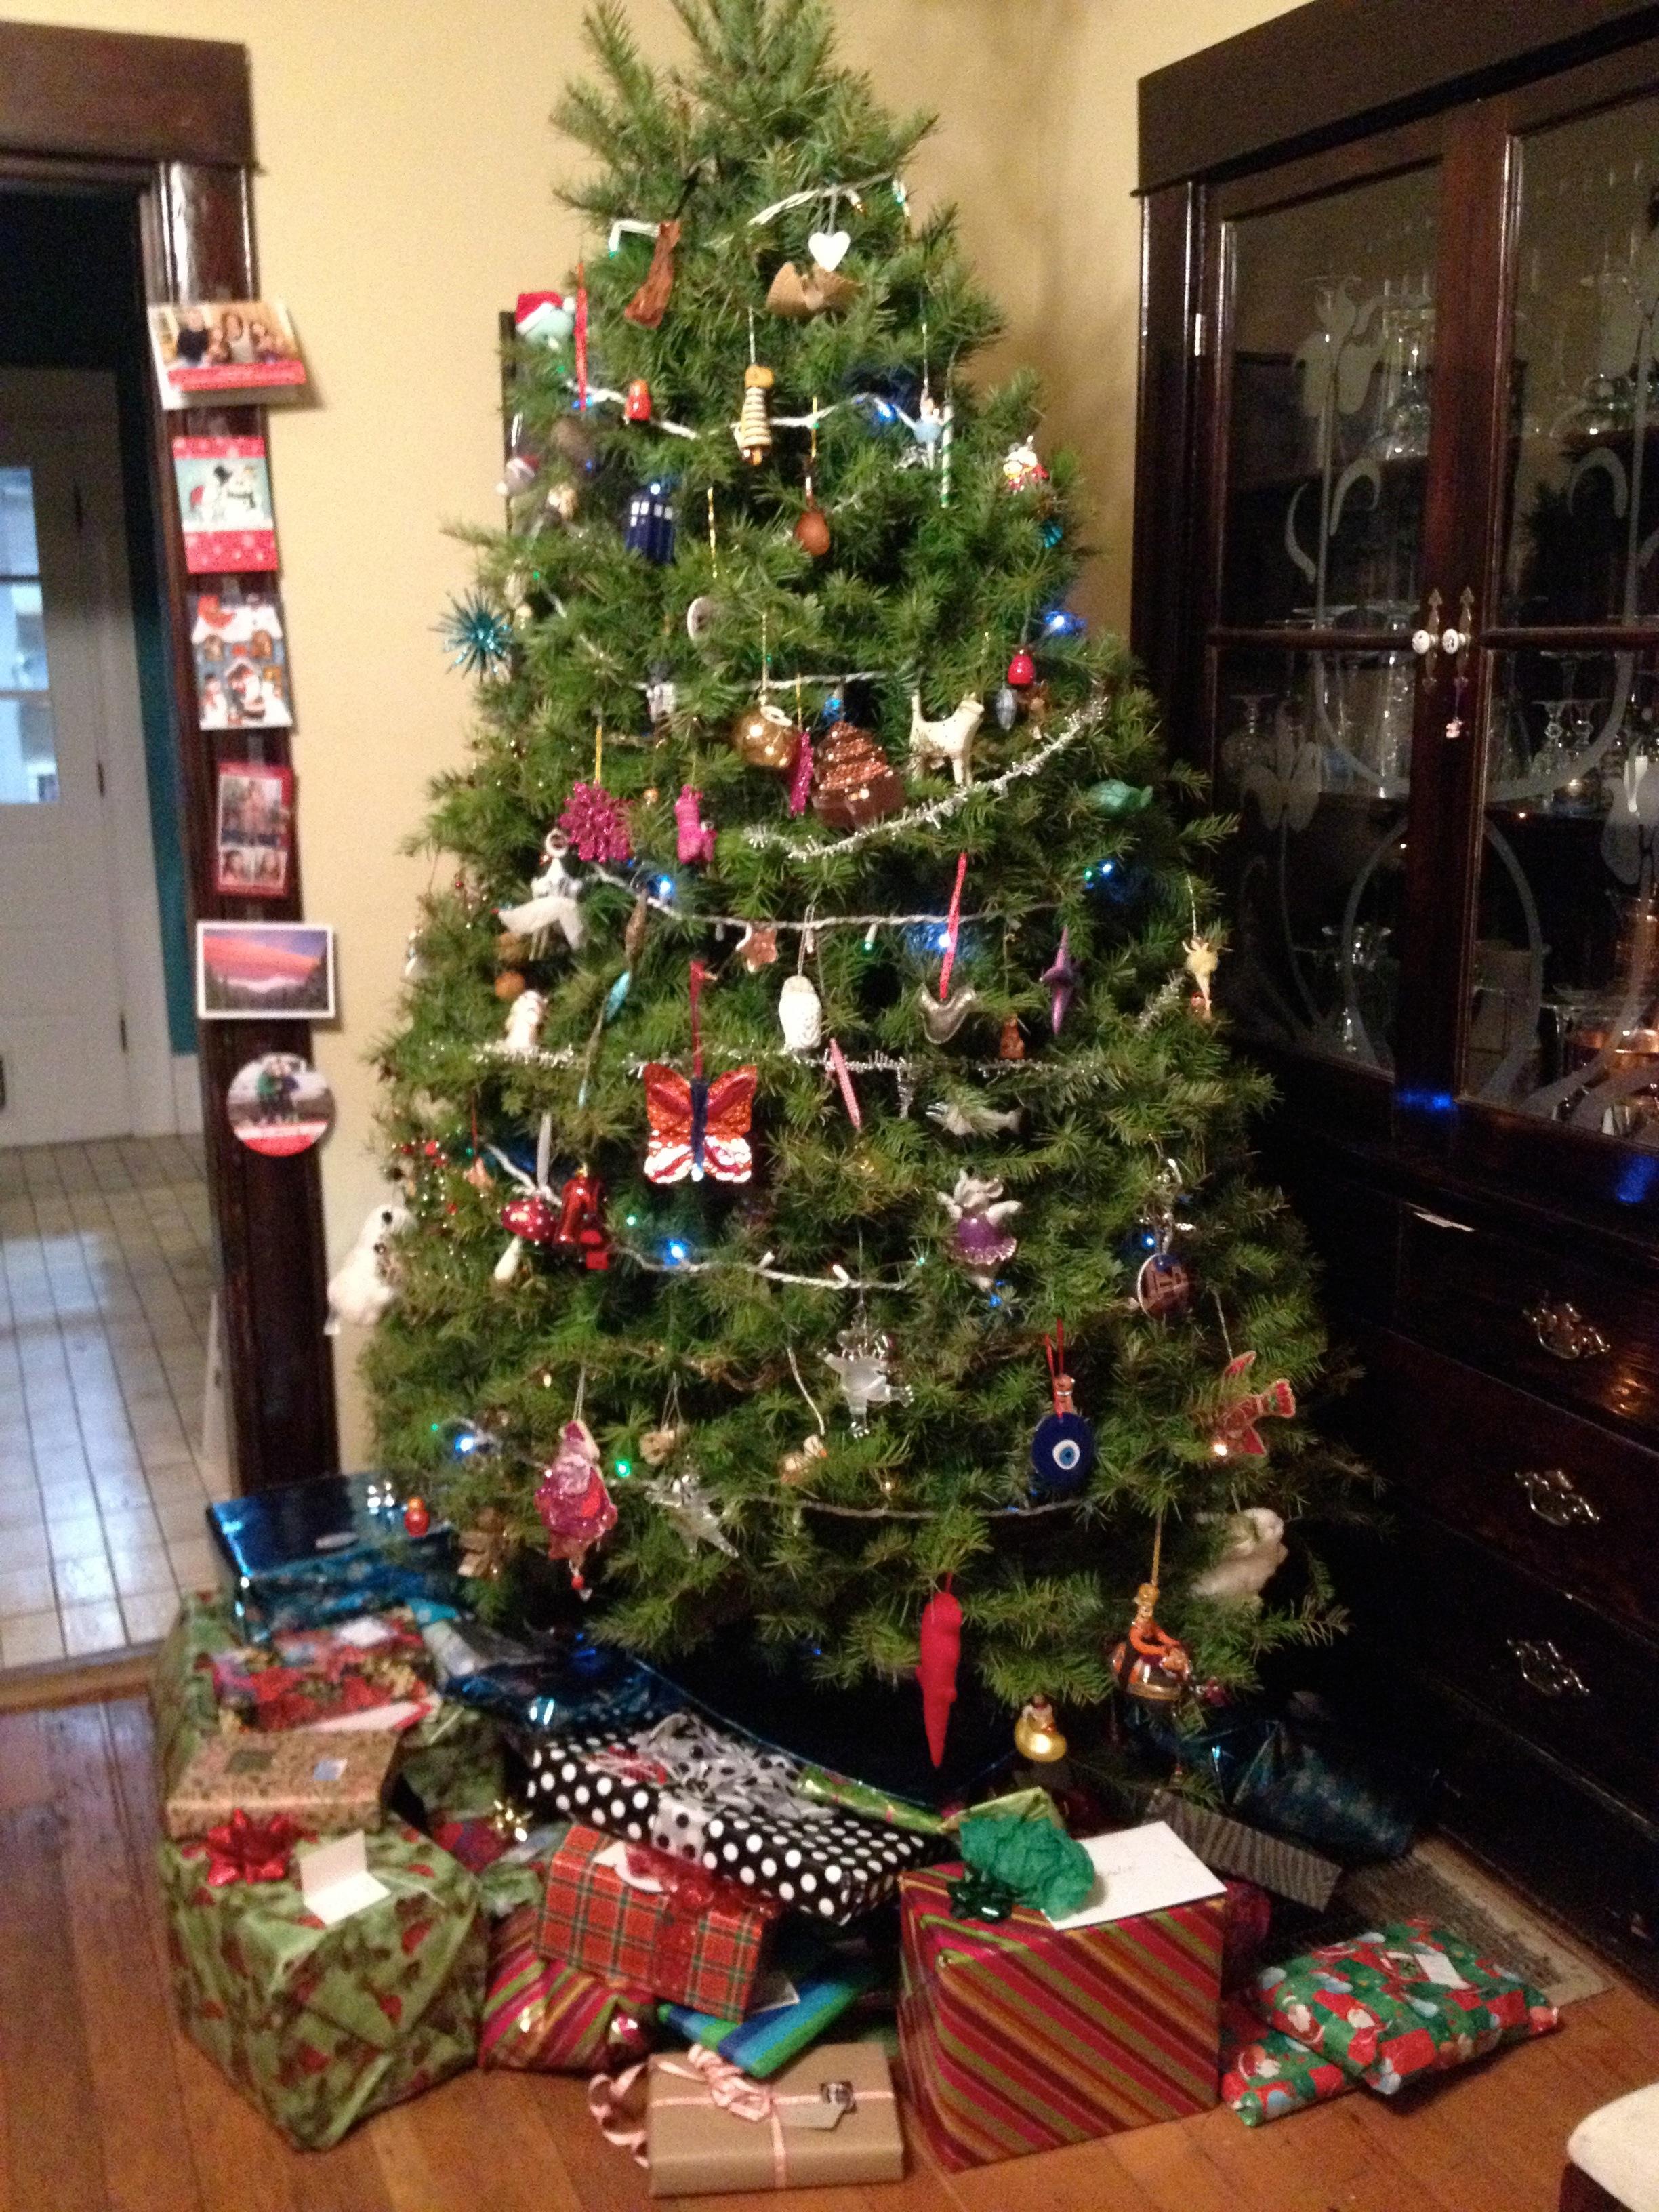 Disney tree ornaments - Christmas Tree